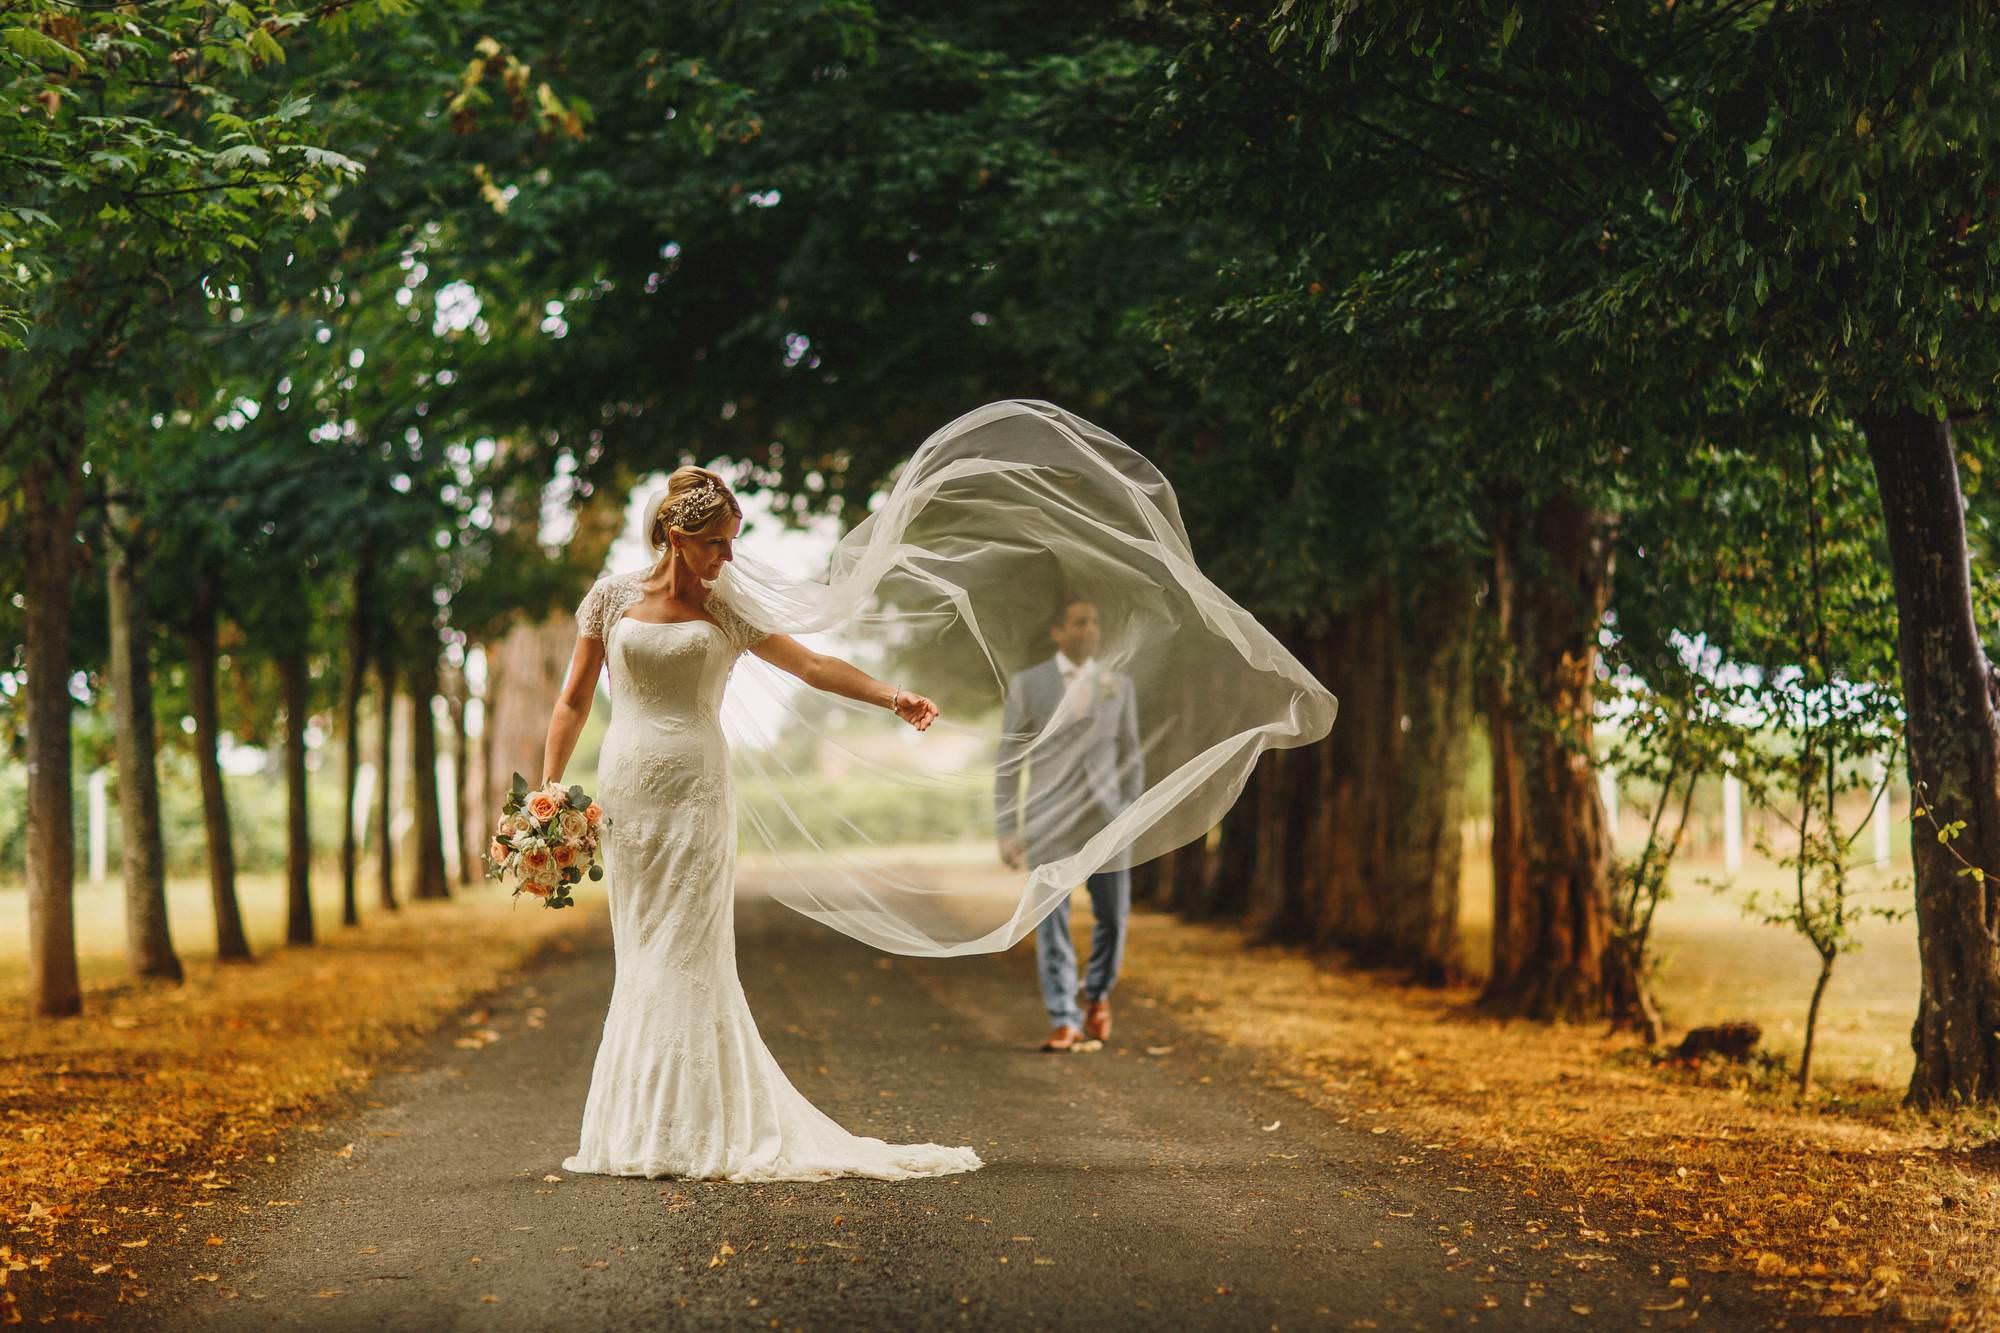 Chateau soulac wedding photography Dordogne